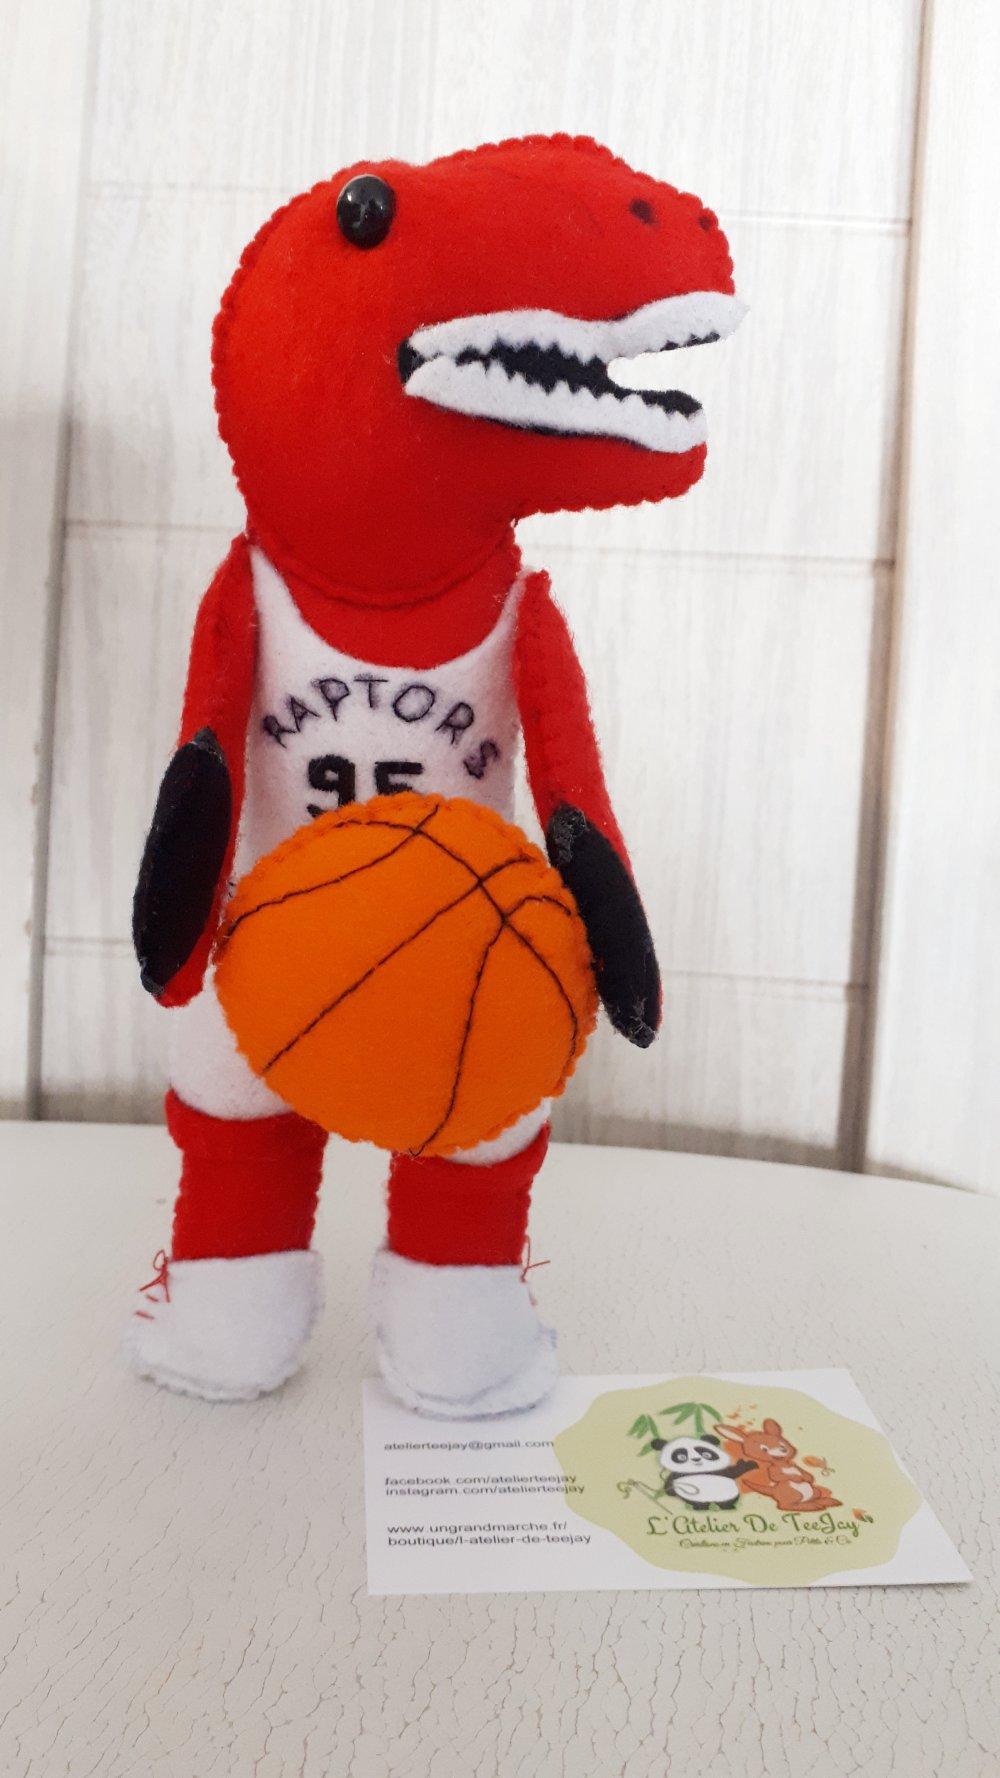 Doudou dinosaure basketteur (vendu)